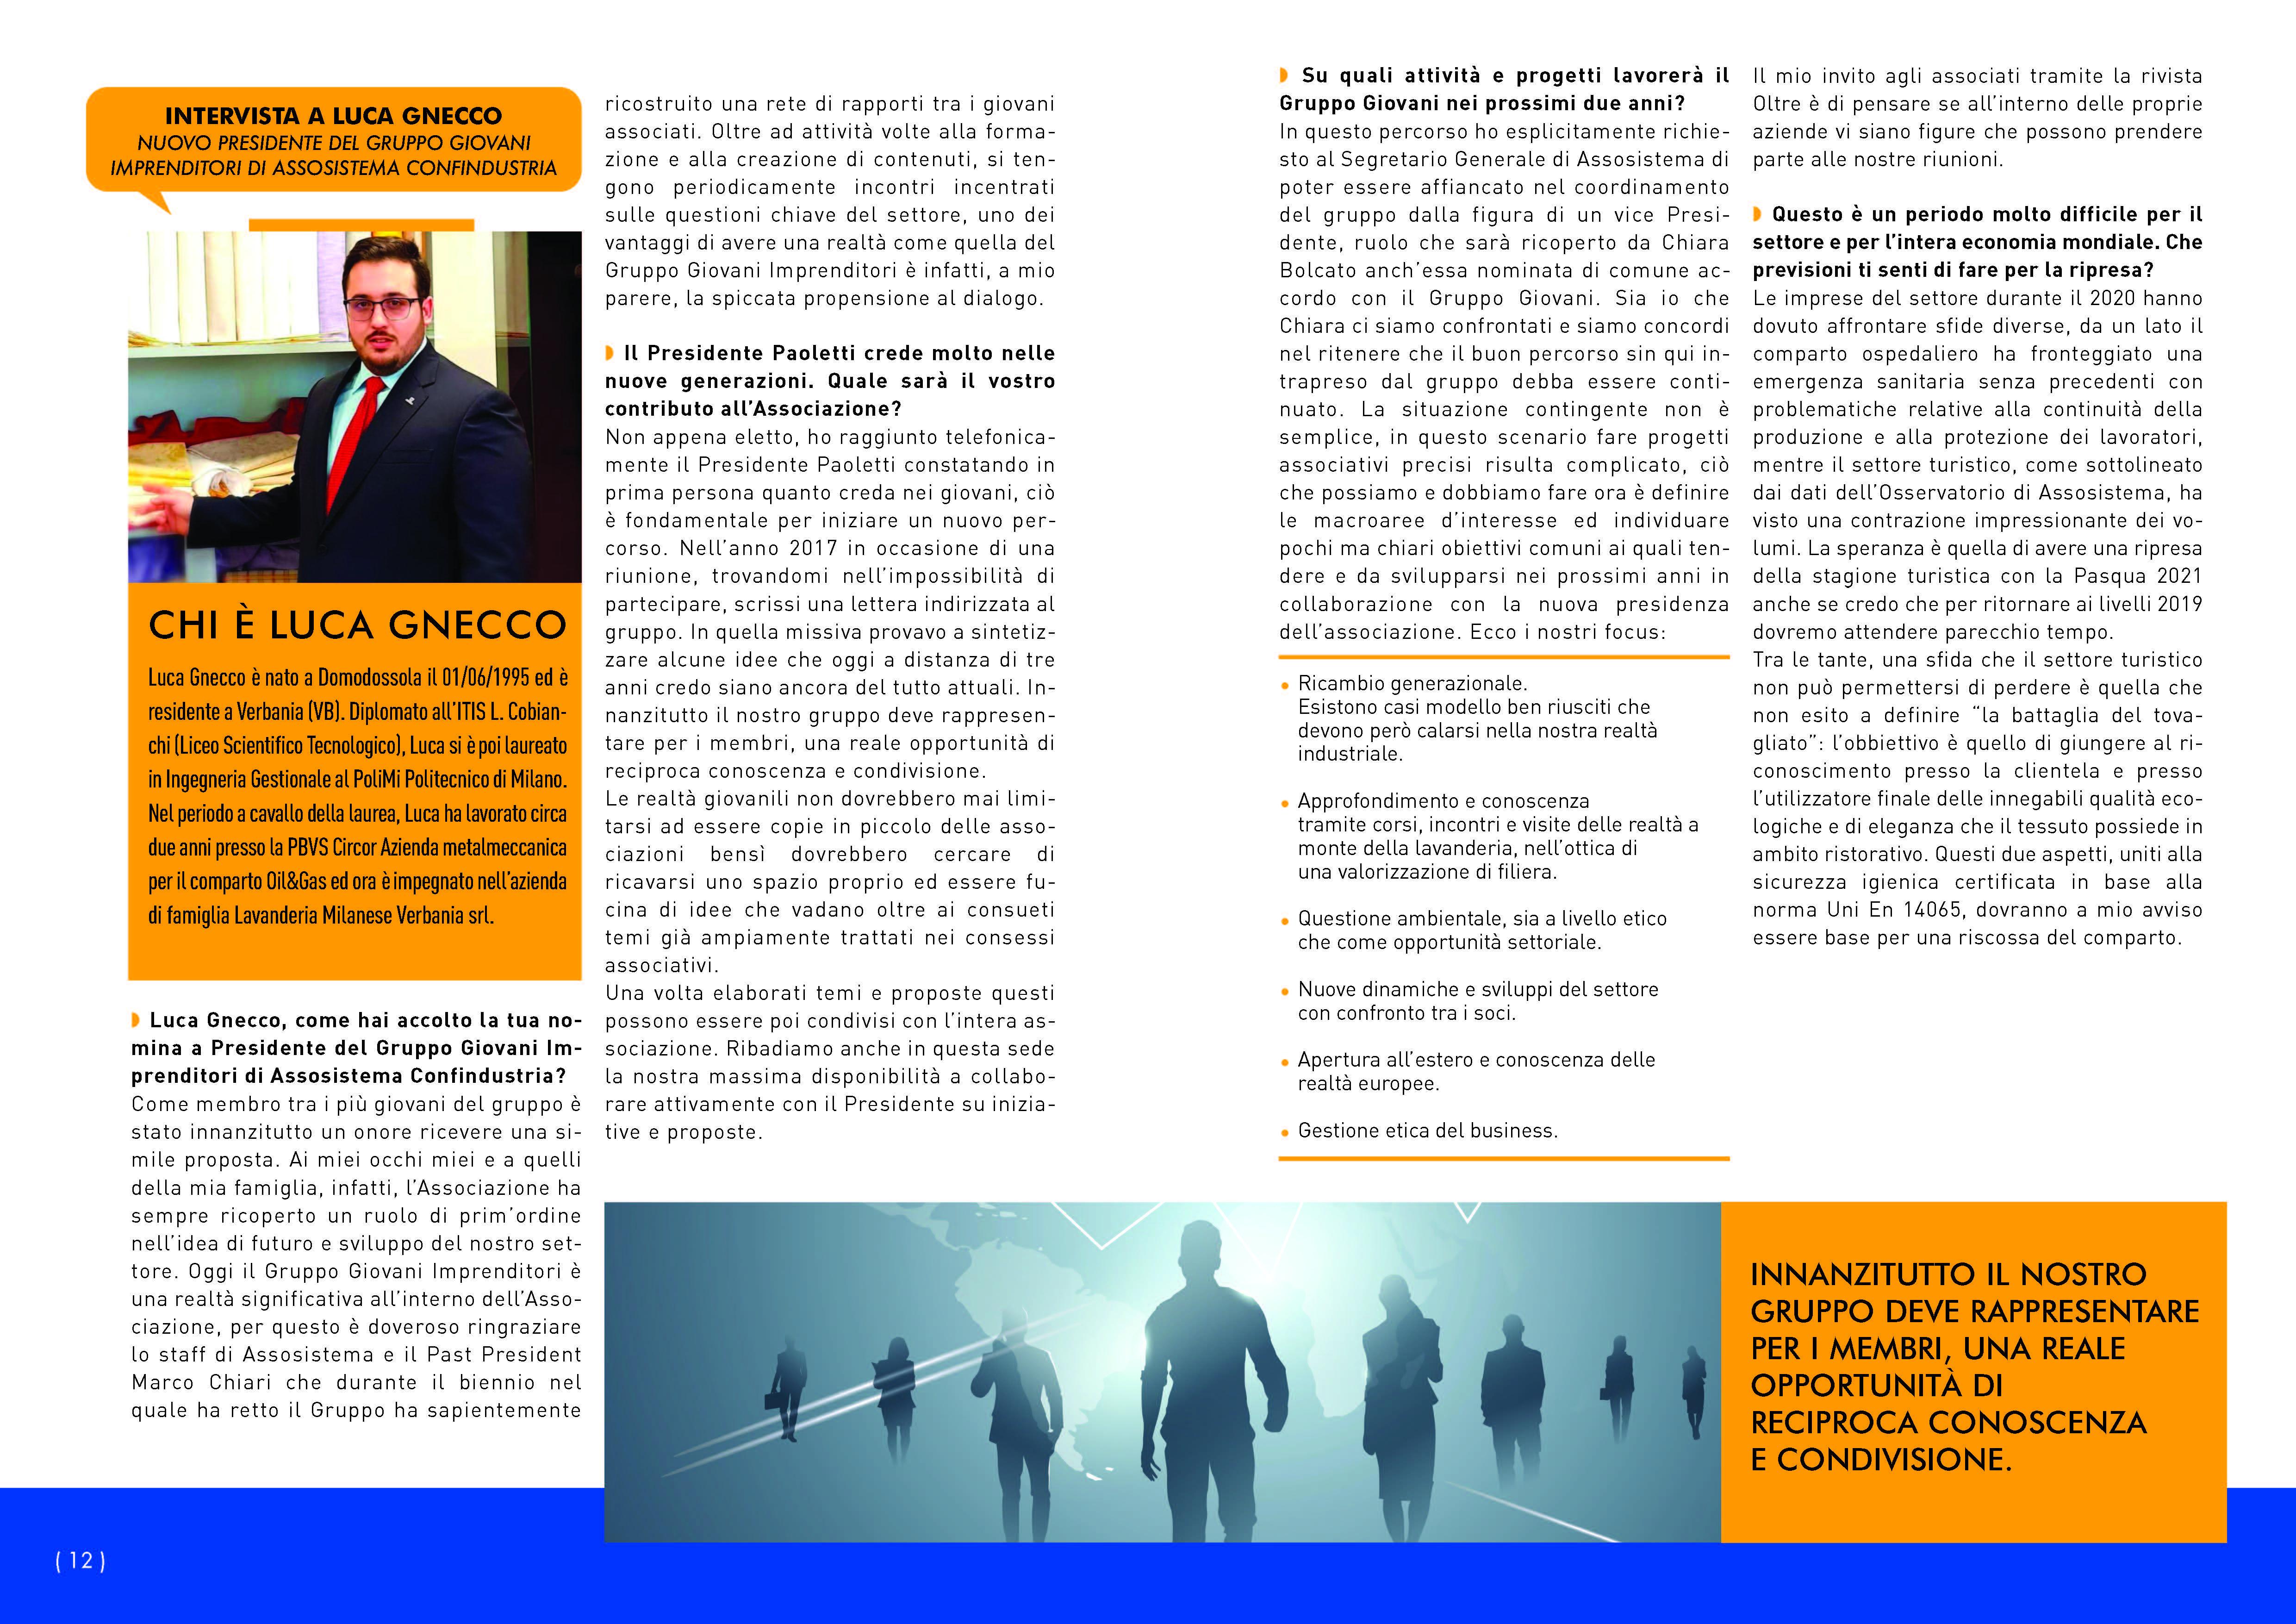 cover_pagina_3